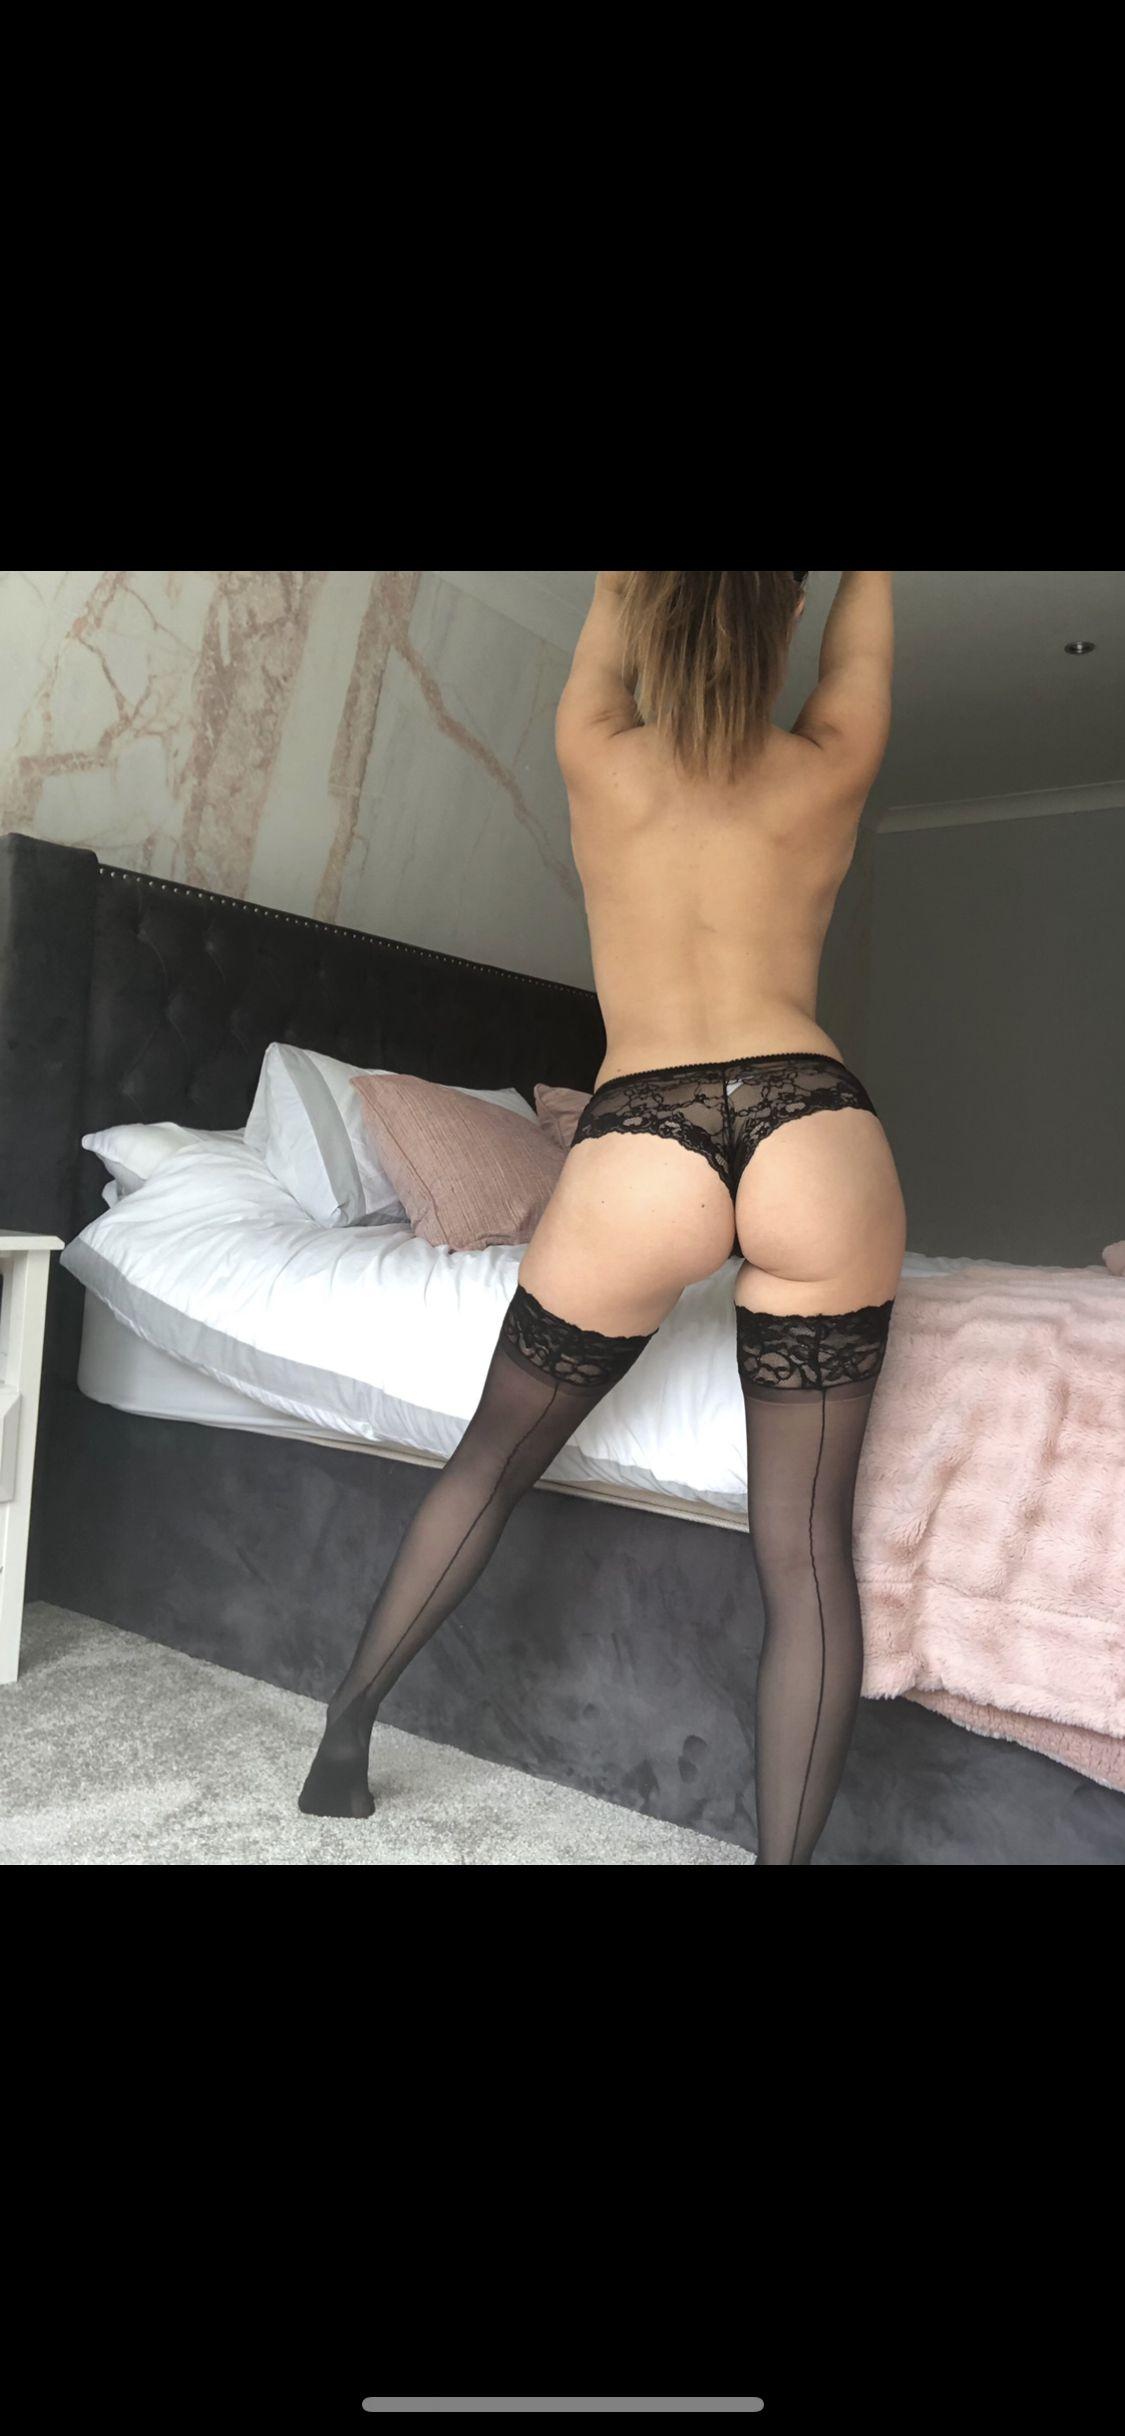 @xxkerrie-anne